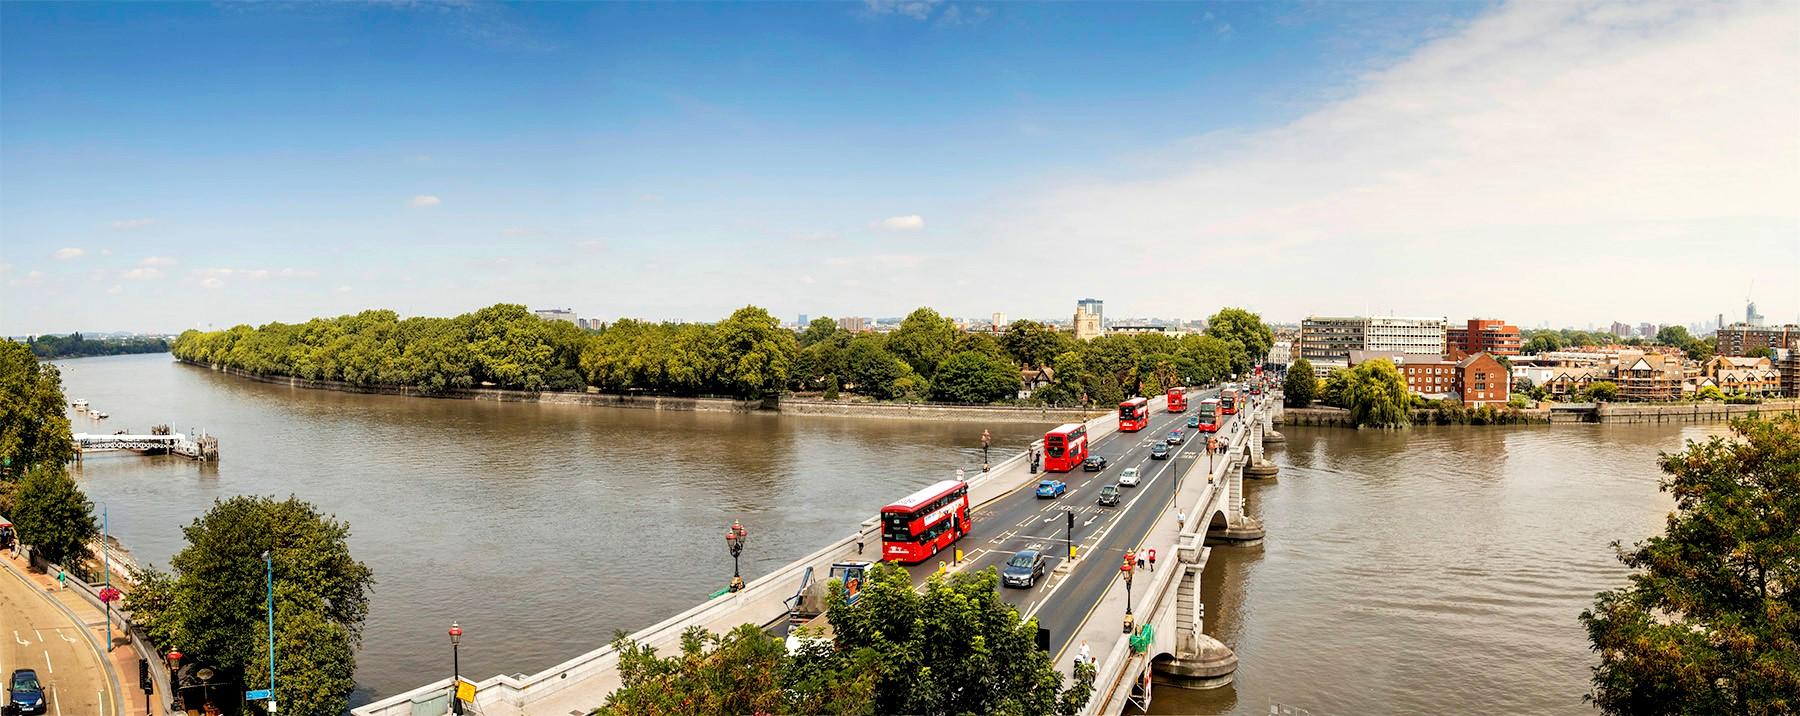 Putney Bridge - Henry Reichhold